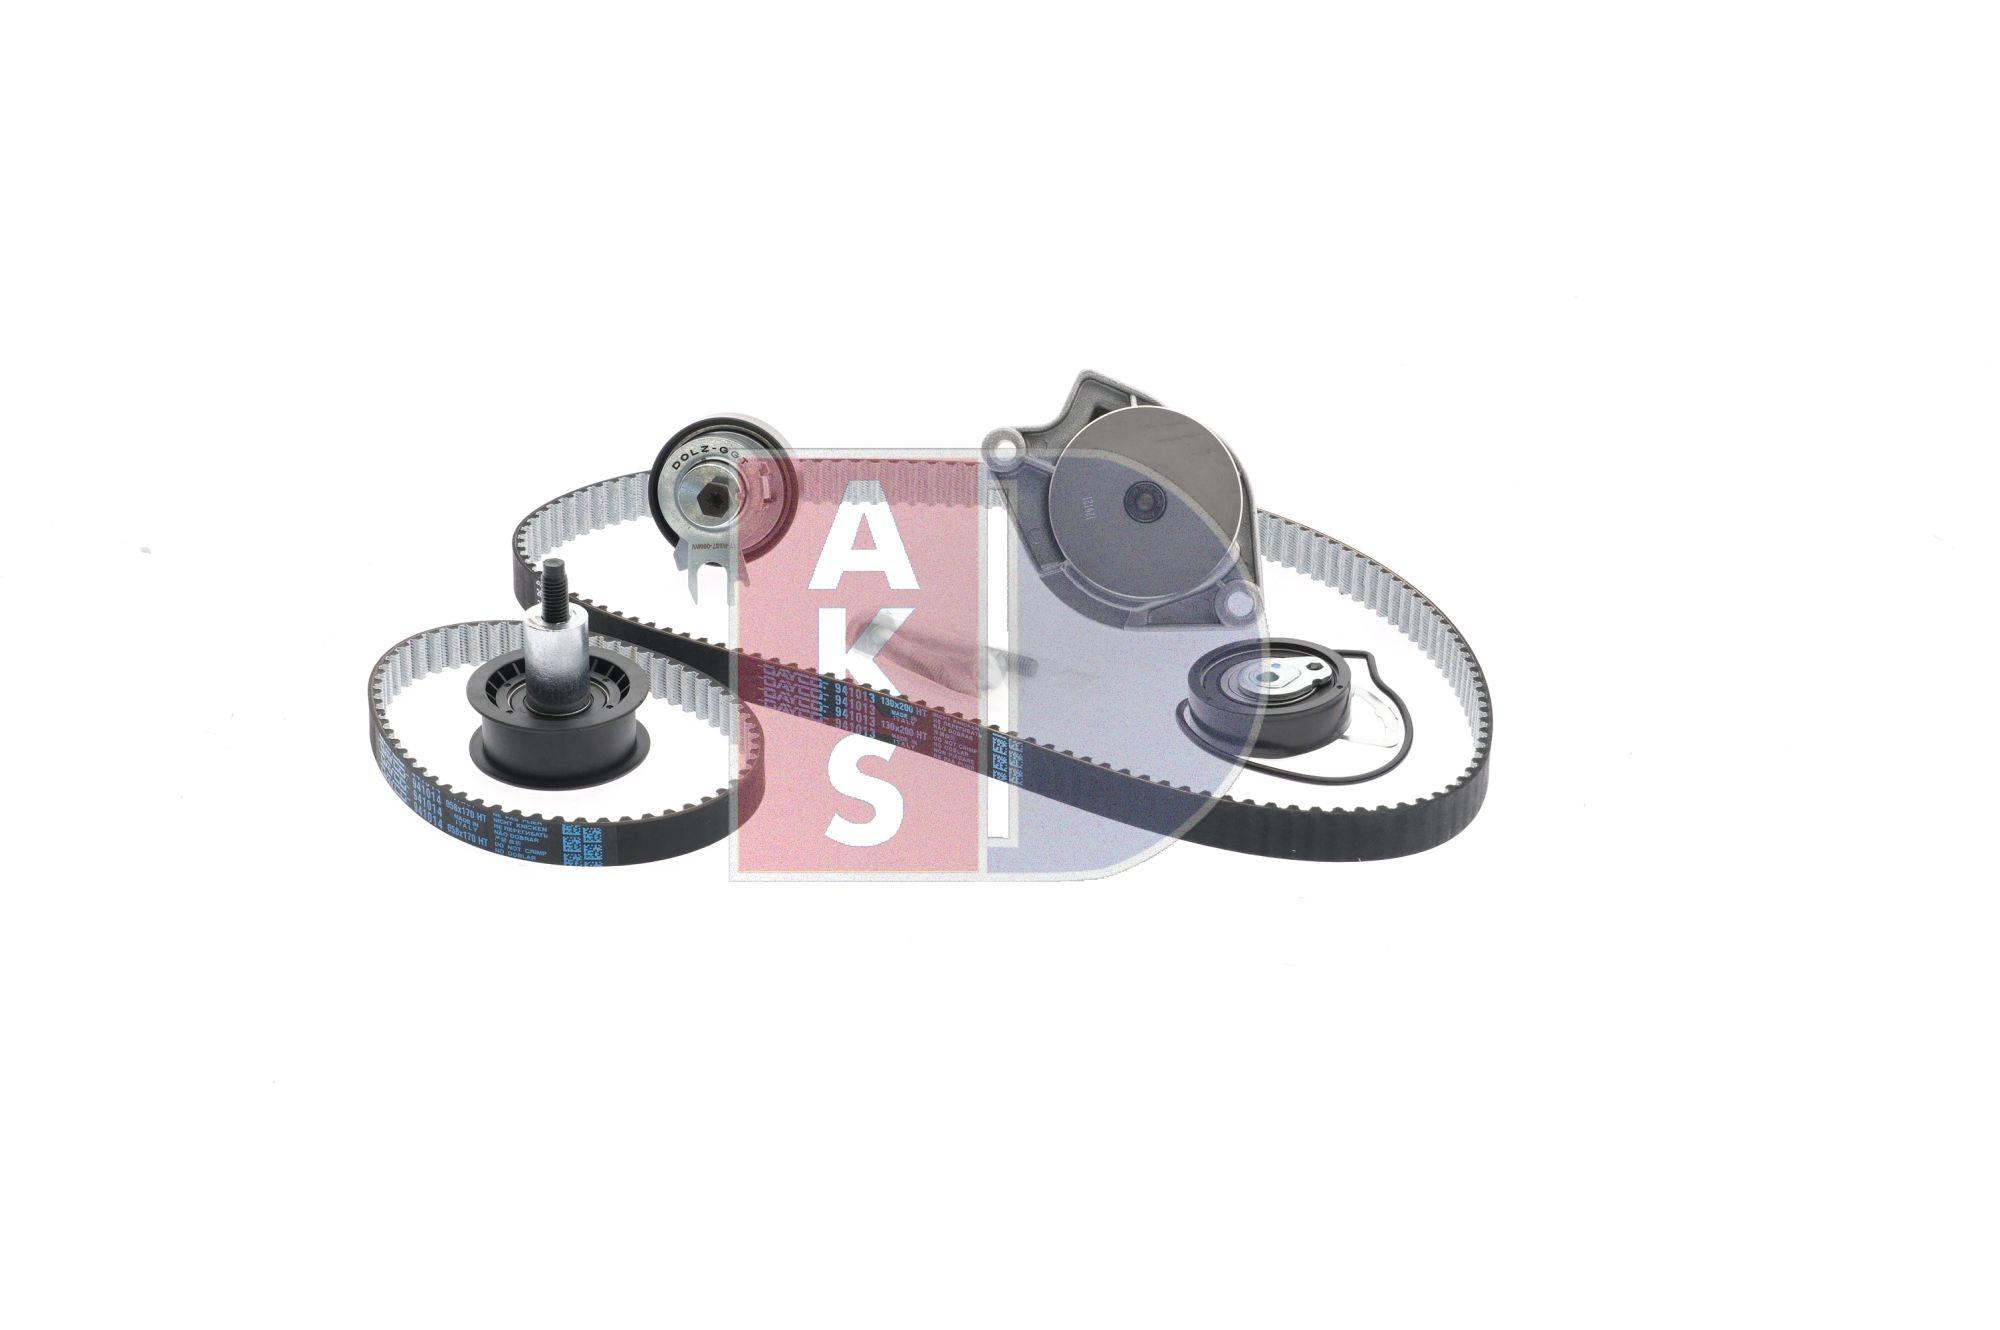 Kit cinghia distribuzione, pompa acqua 570320N GOLF 6 (5K1) 1.4 ac 2012